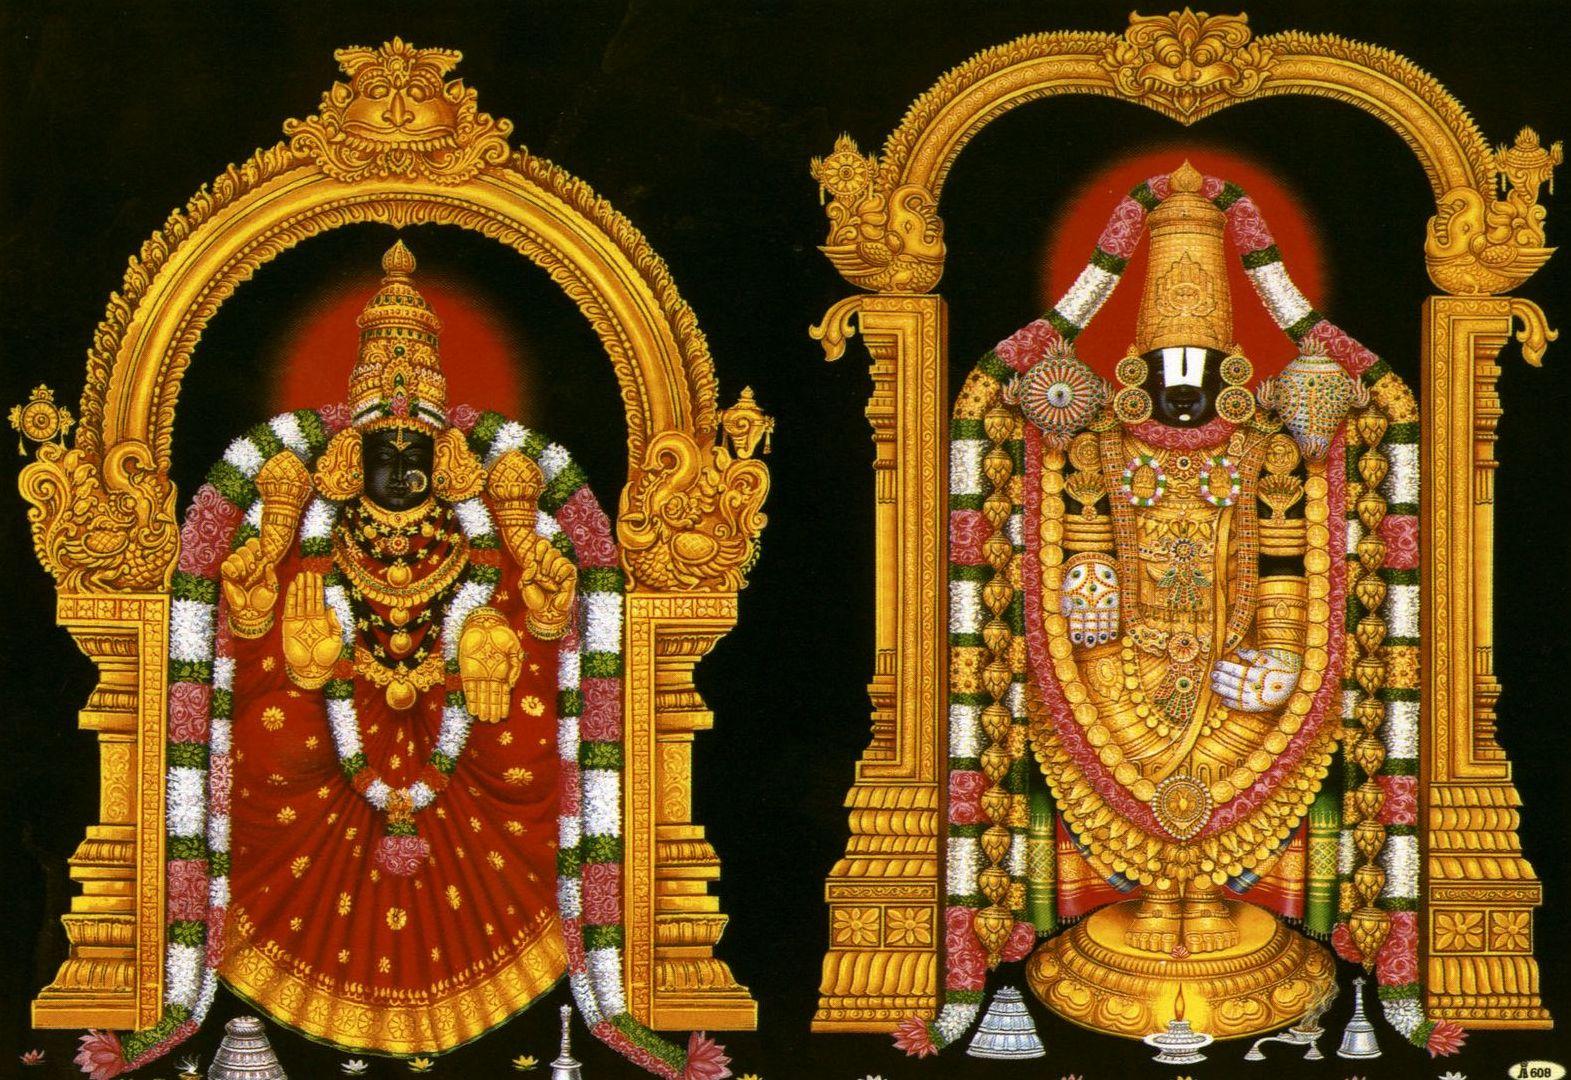 Tirupati Balaji Photos Free Download God Balaji Images Hd Pics